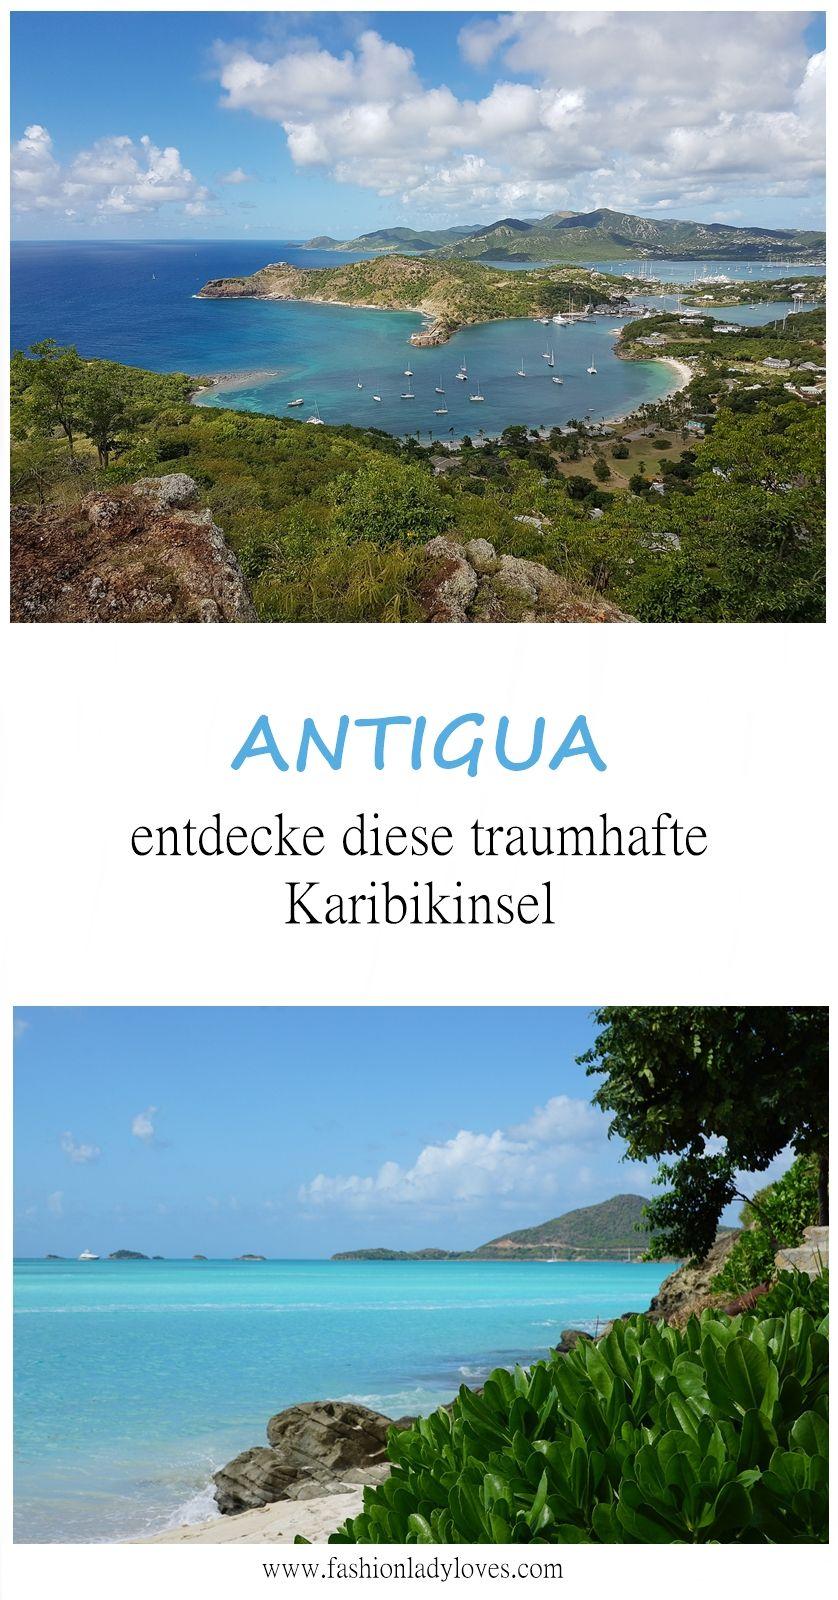 Antigua Travel Guide Fashionladyloves Karibik Reisen Kuba Rundreise Karibik